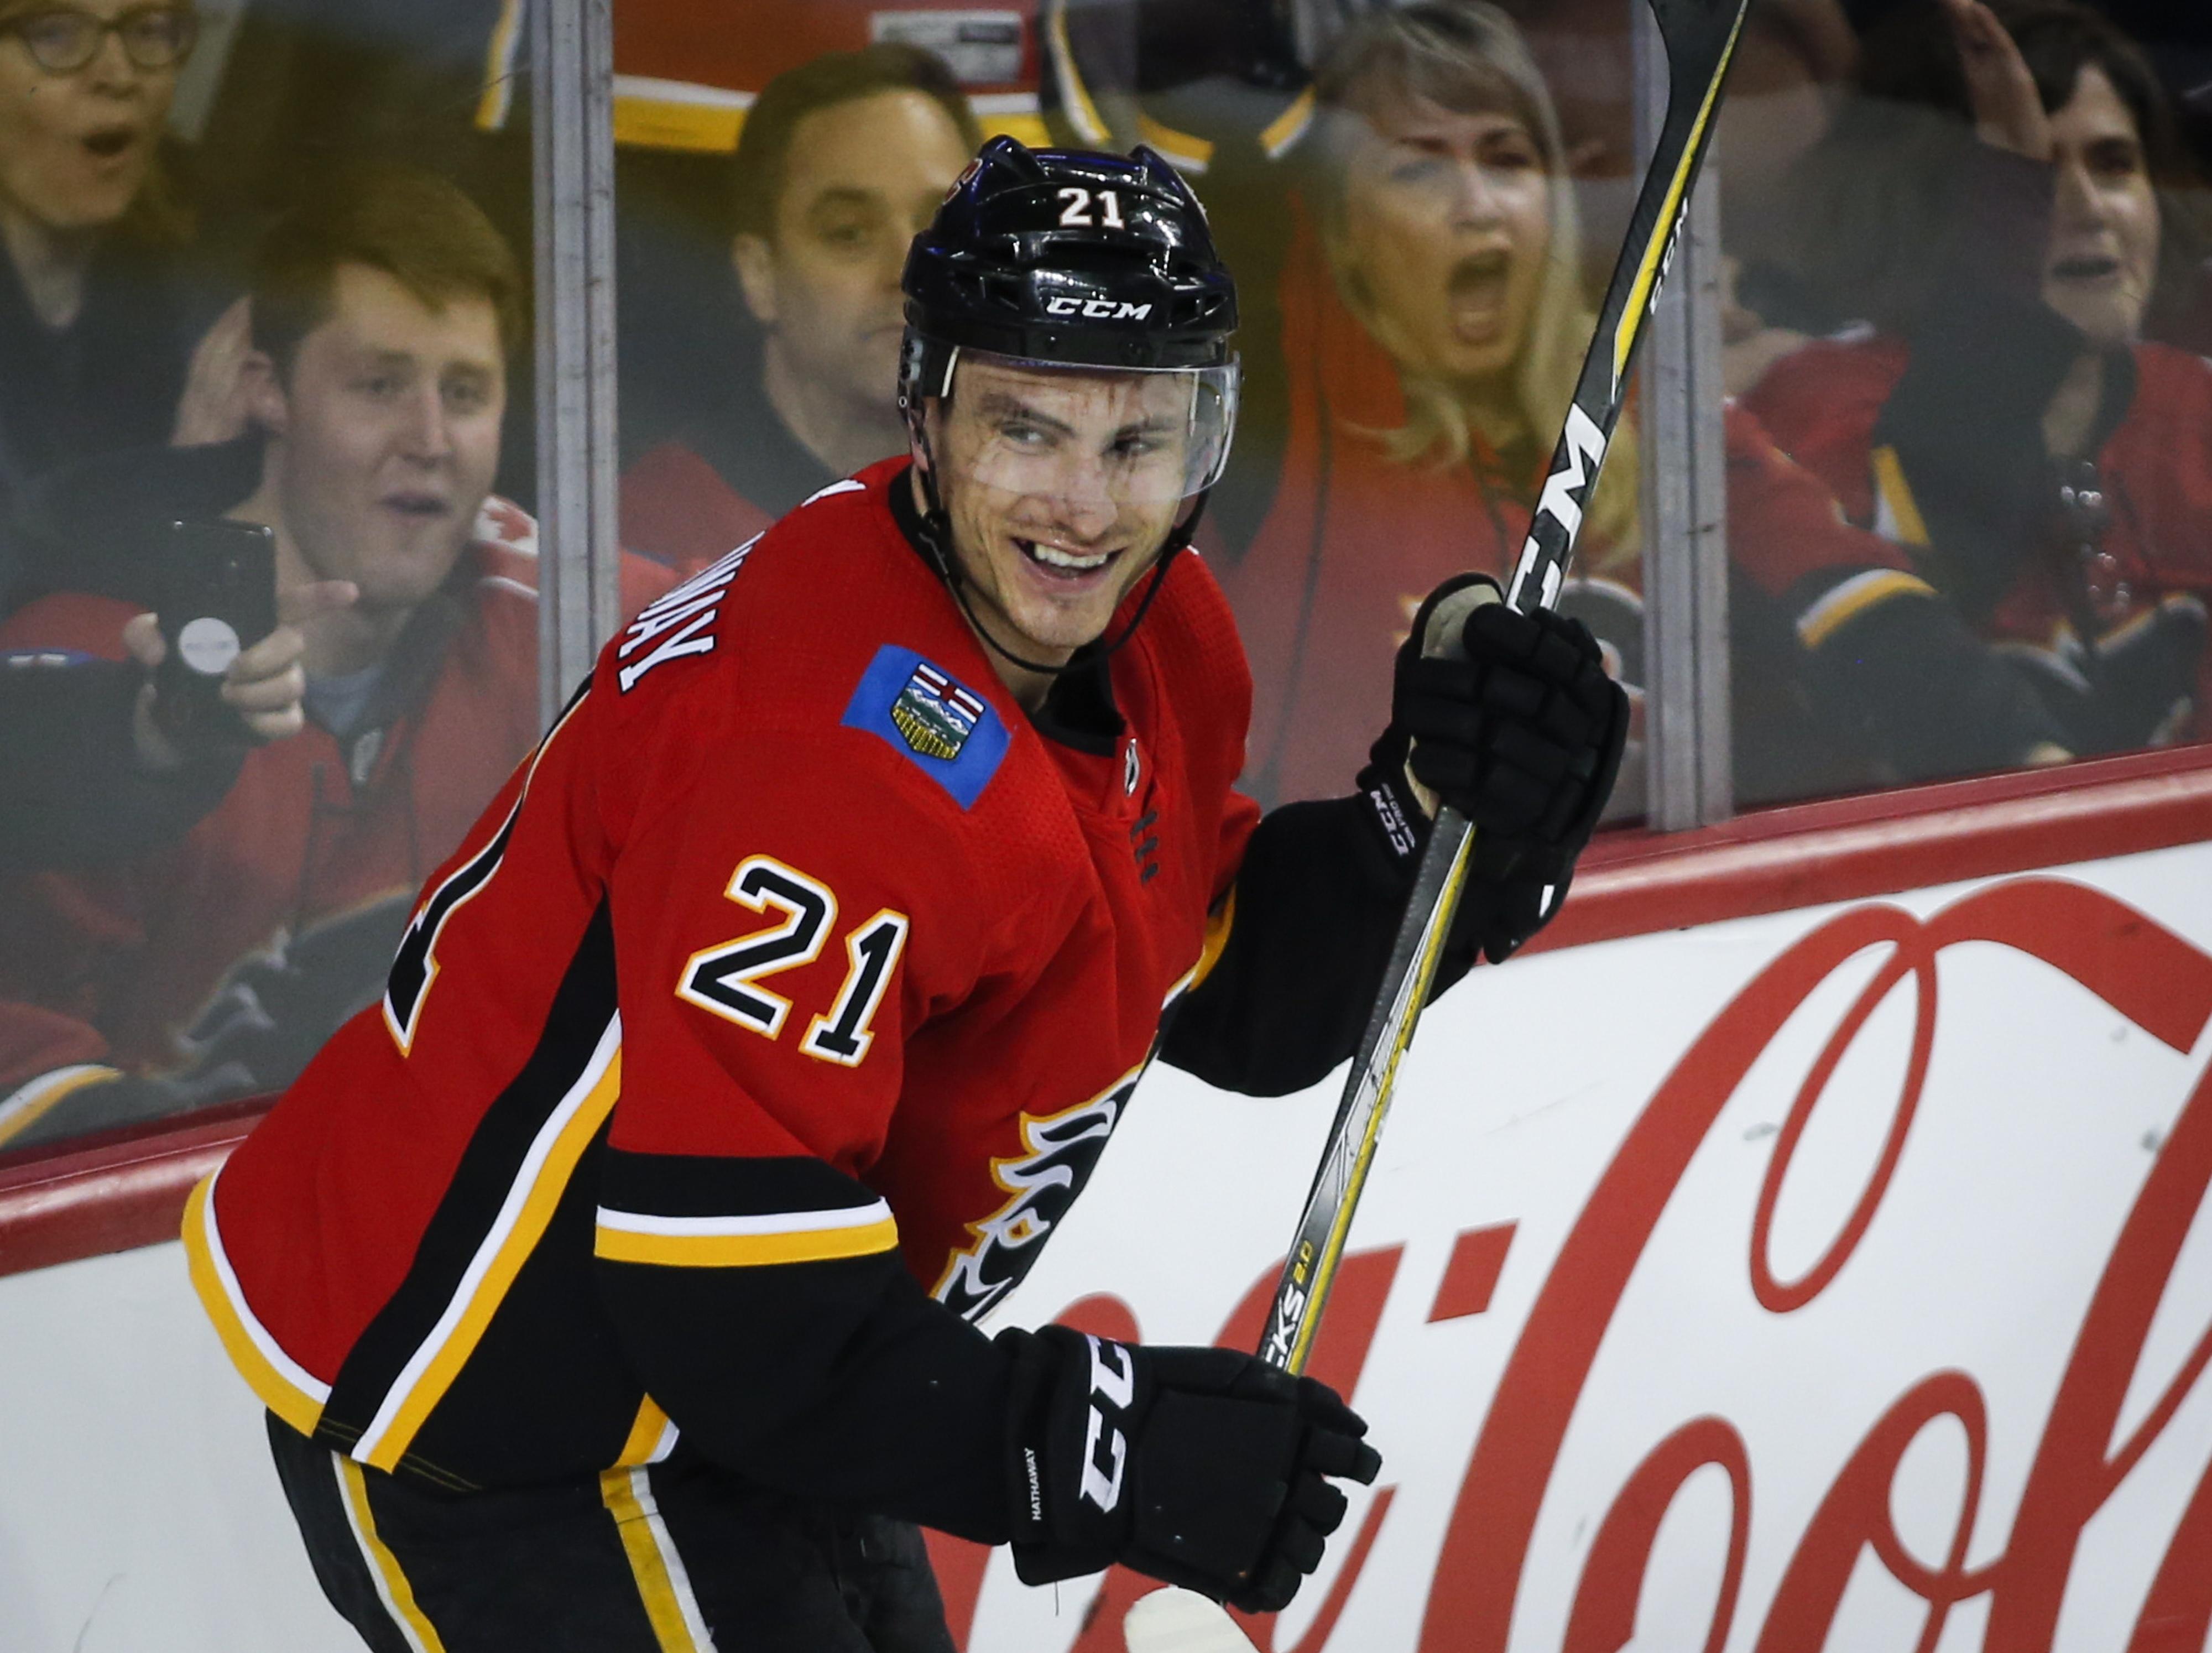 Smith makes 18 saves as Flames top Senators 5-1